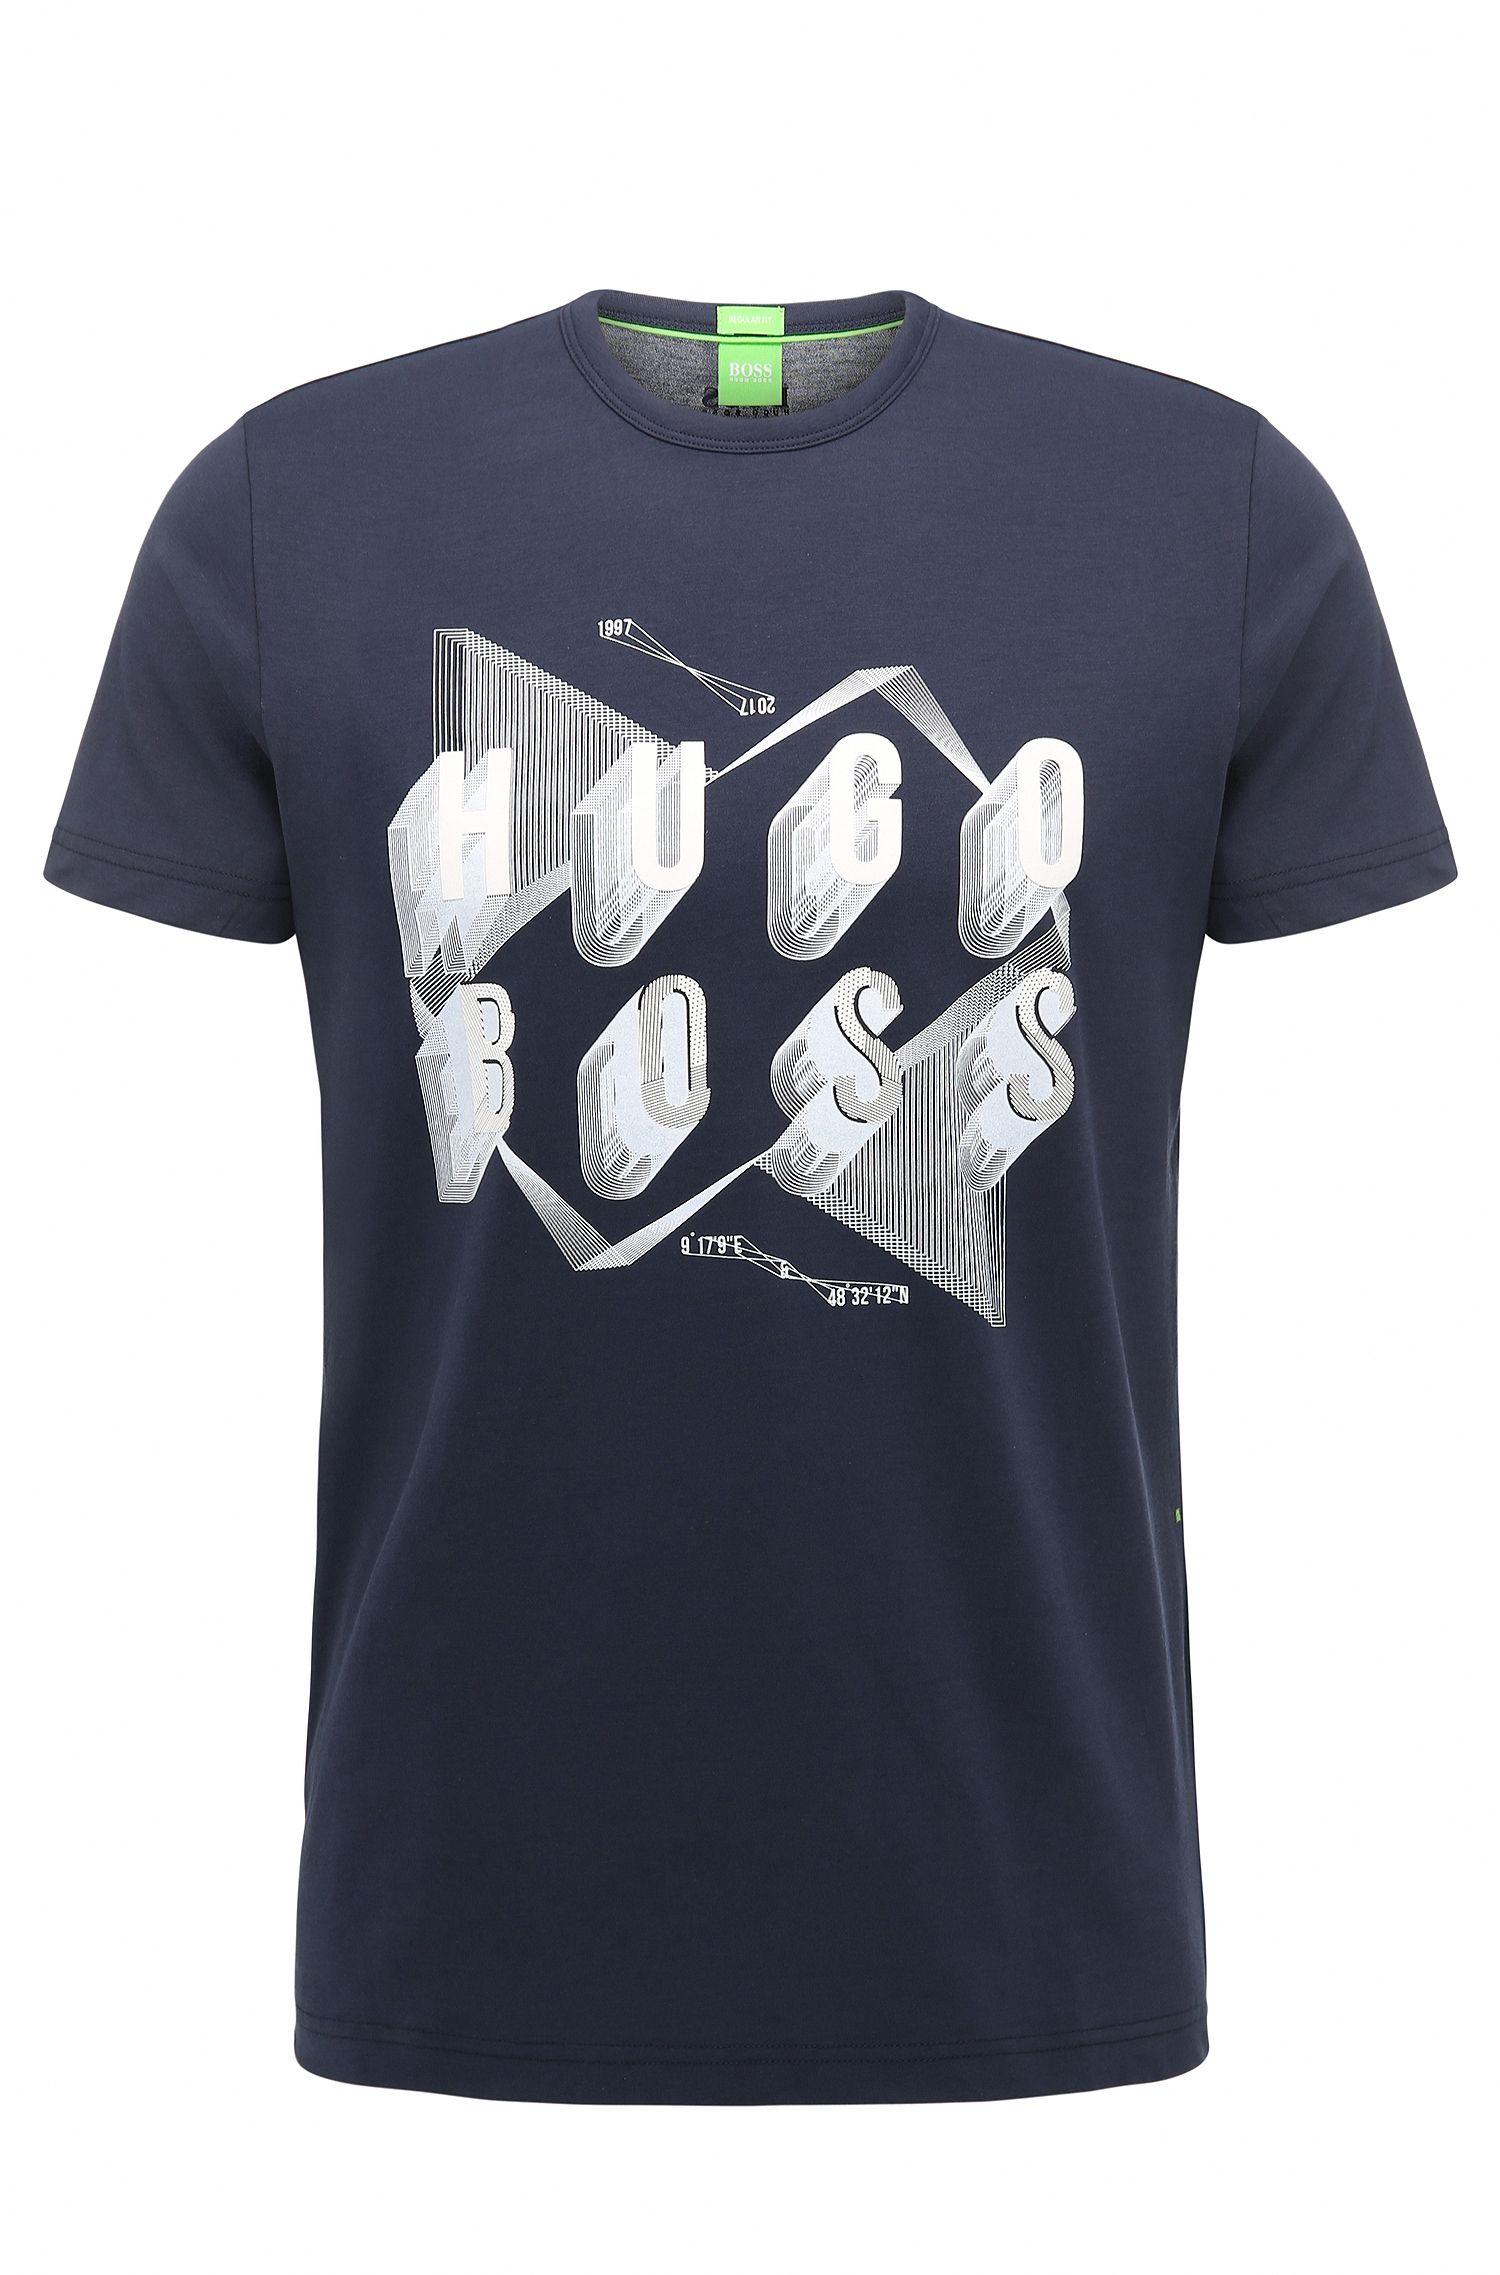 Cotton Graphic T-Shirt | Teeos